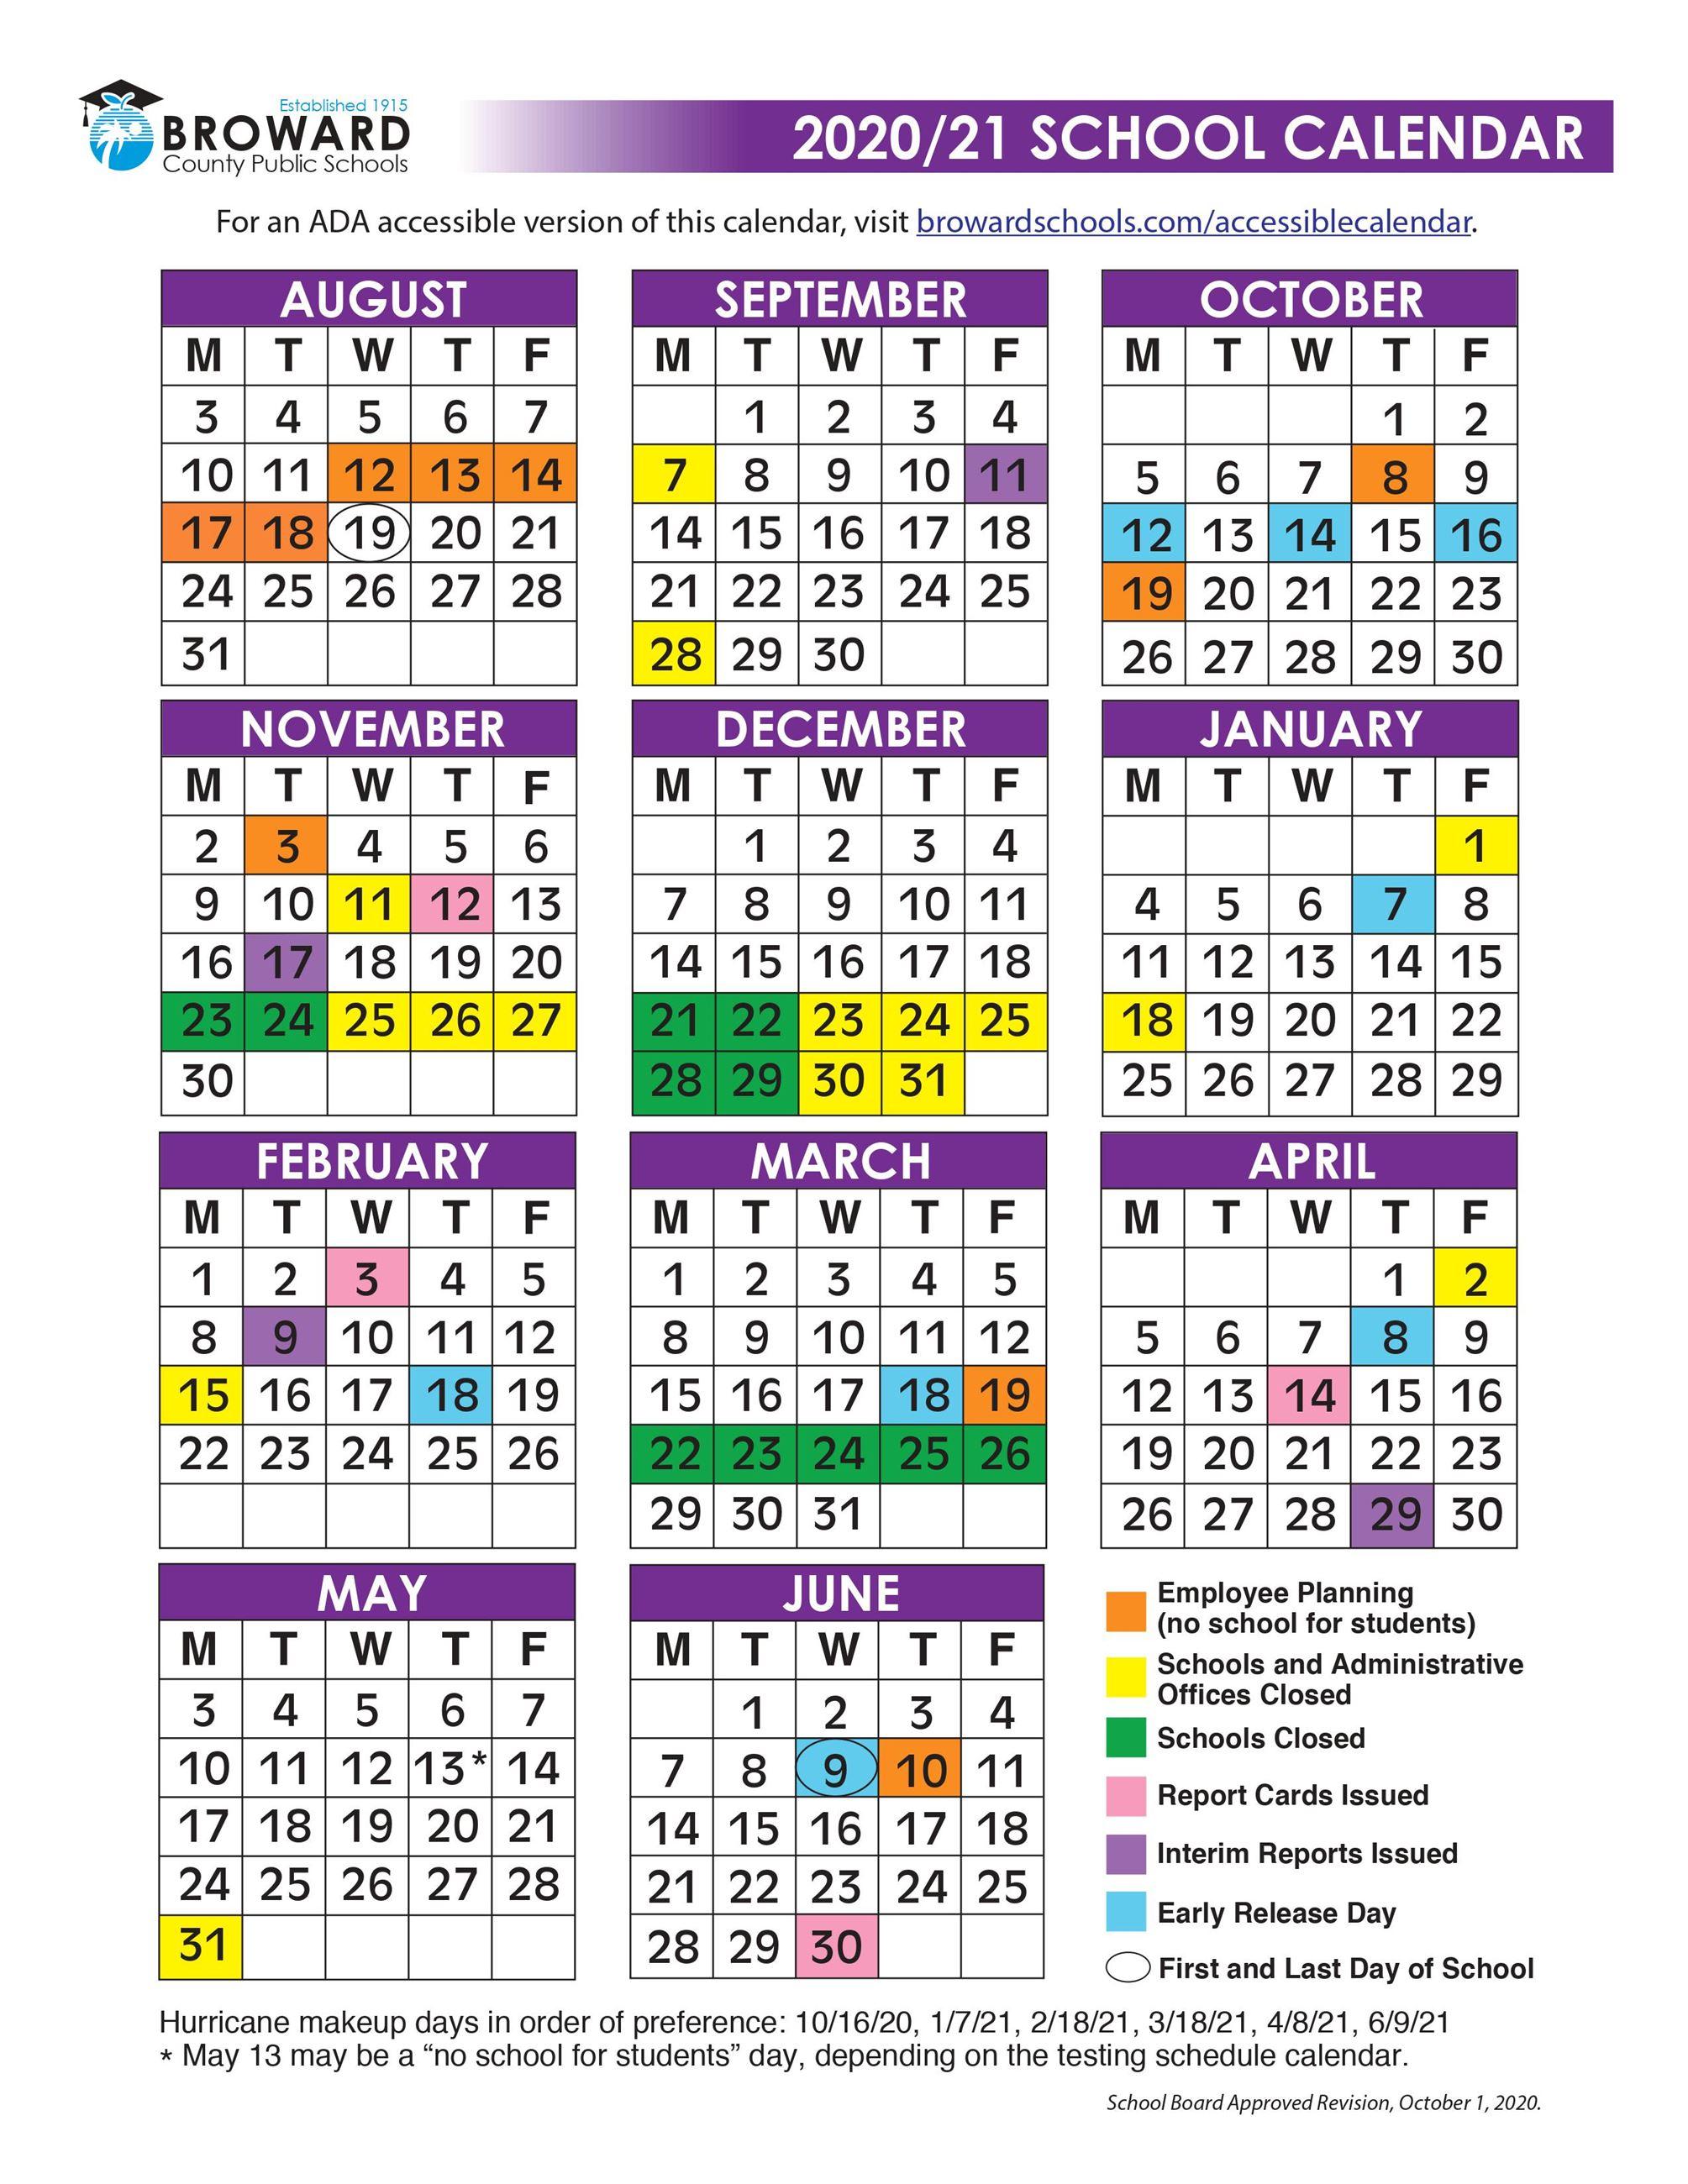 West Point 2021-2022 Calendar PPCS 2020 2021 Calendar | West Elementary and Middle School, FL